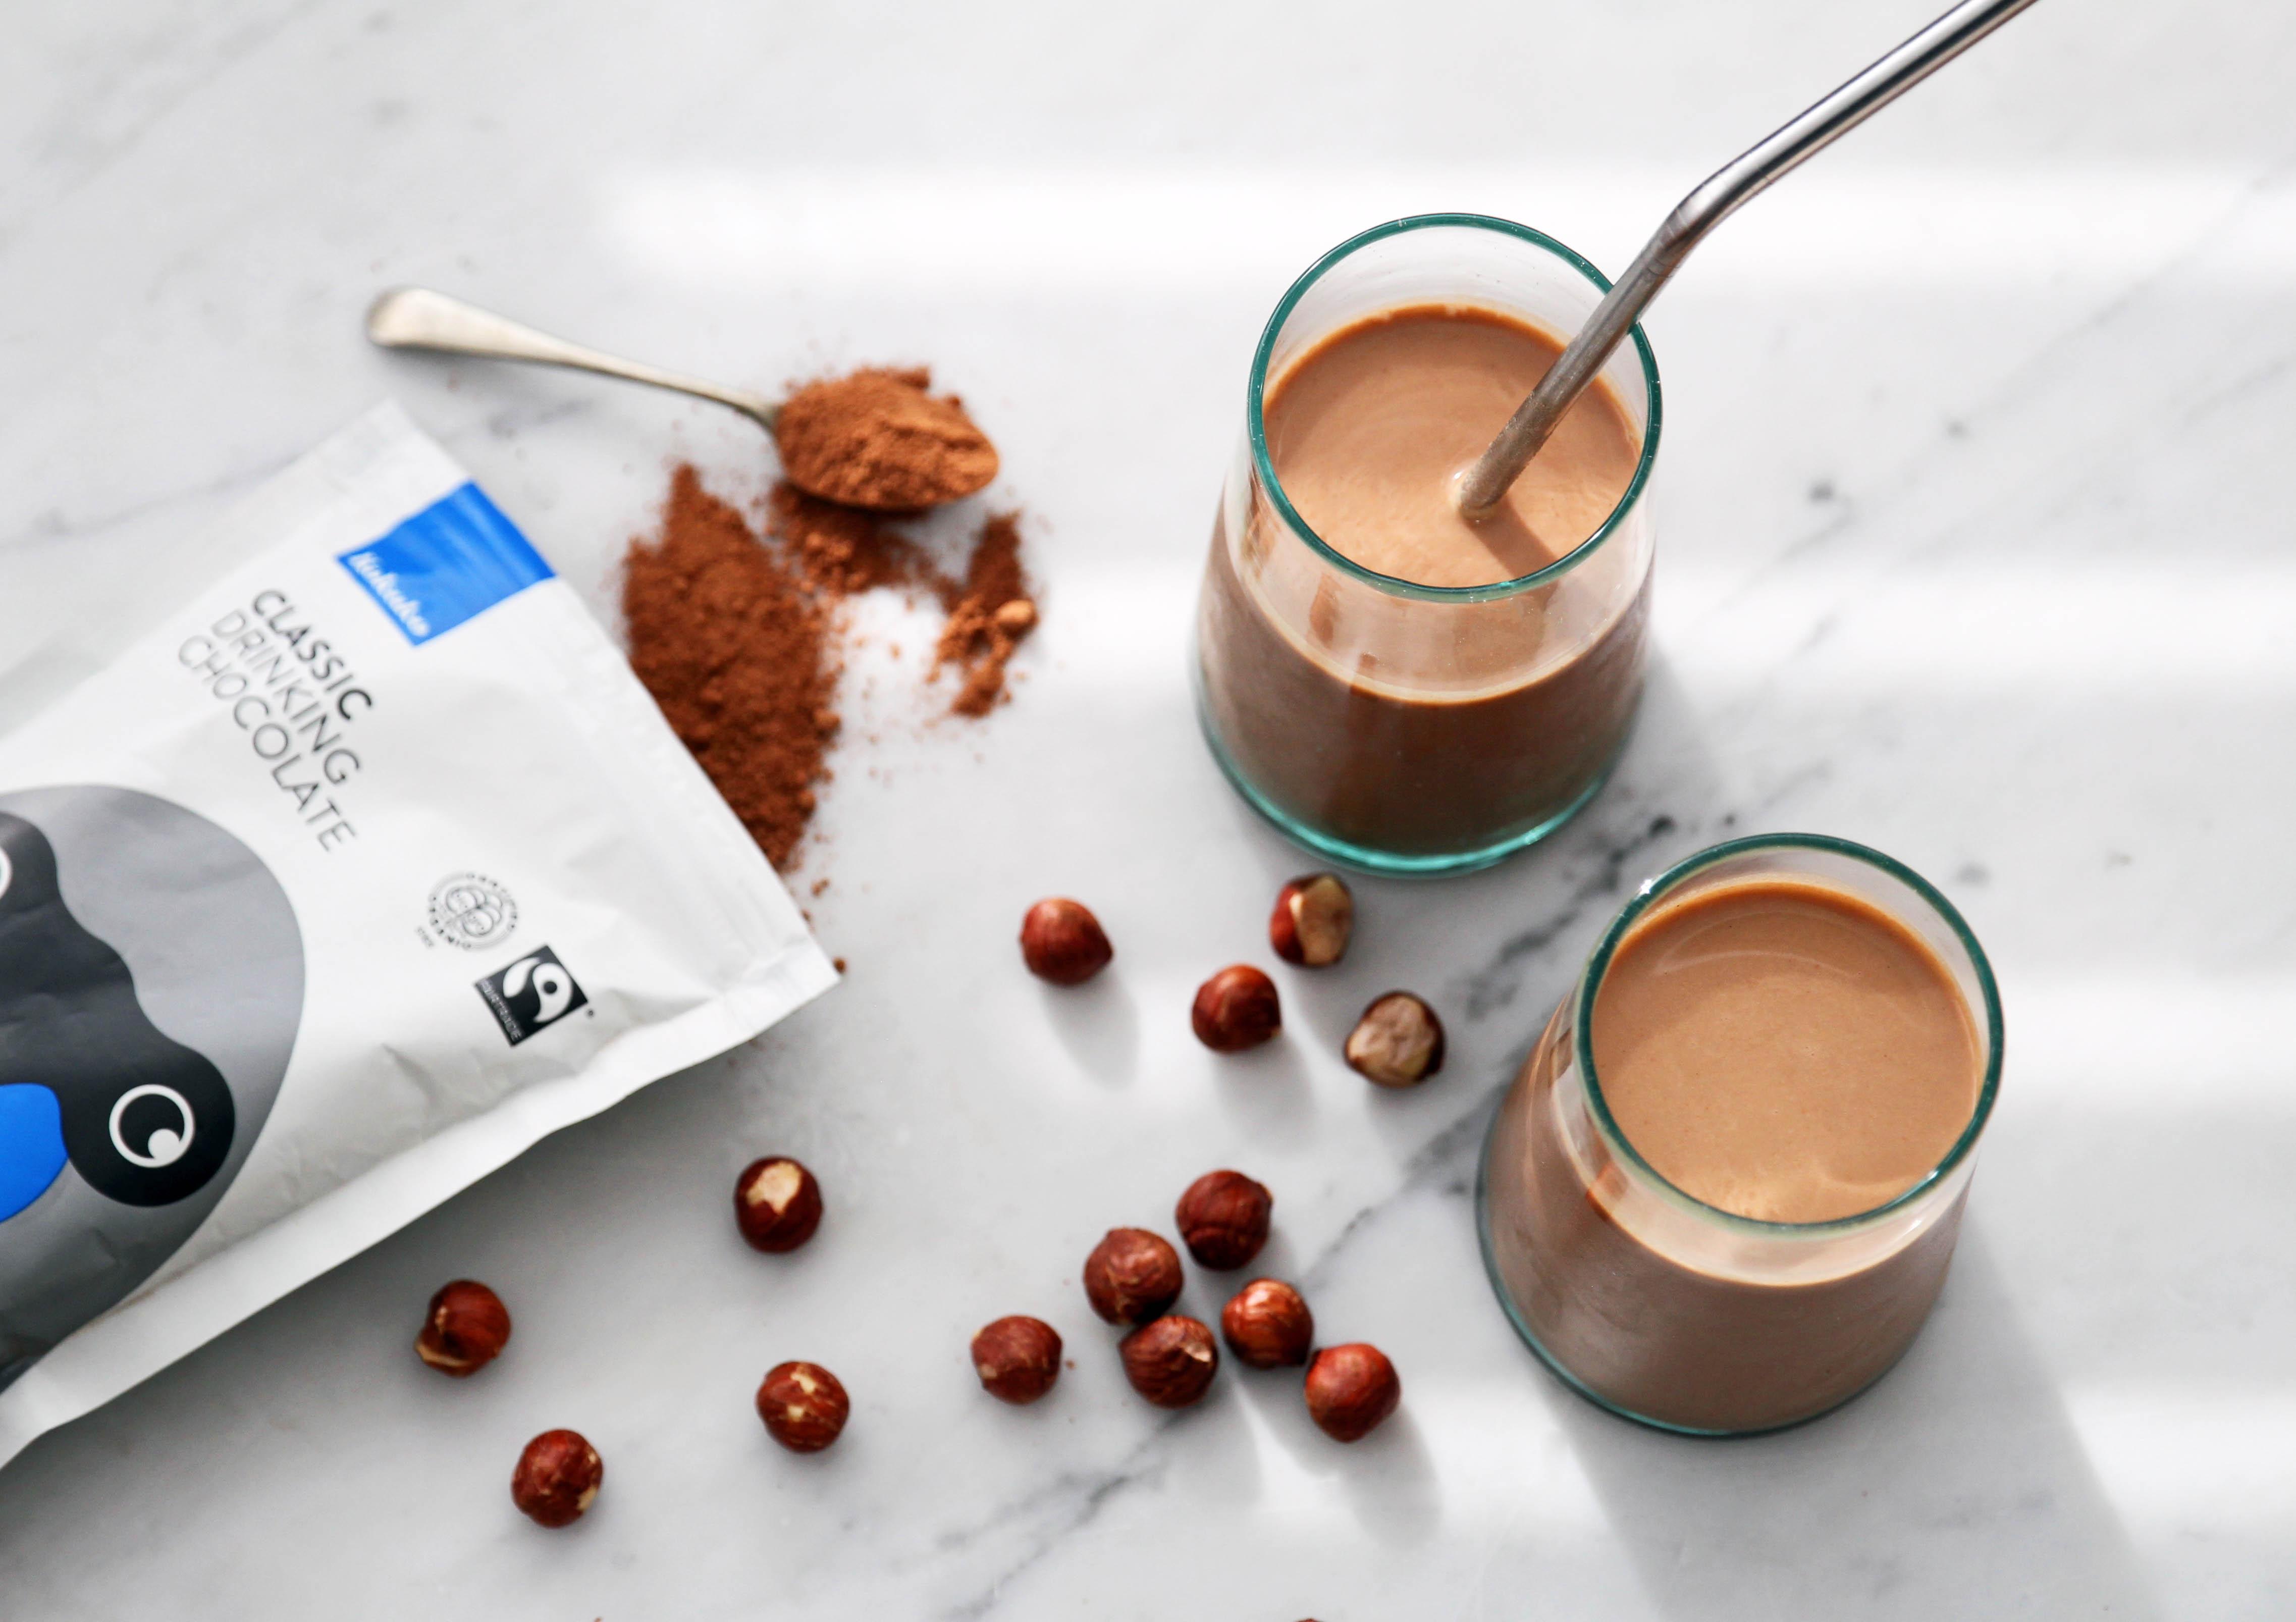 recipe: roasted hazelnut & chocolate milk